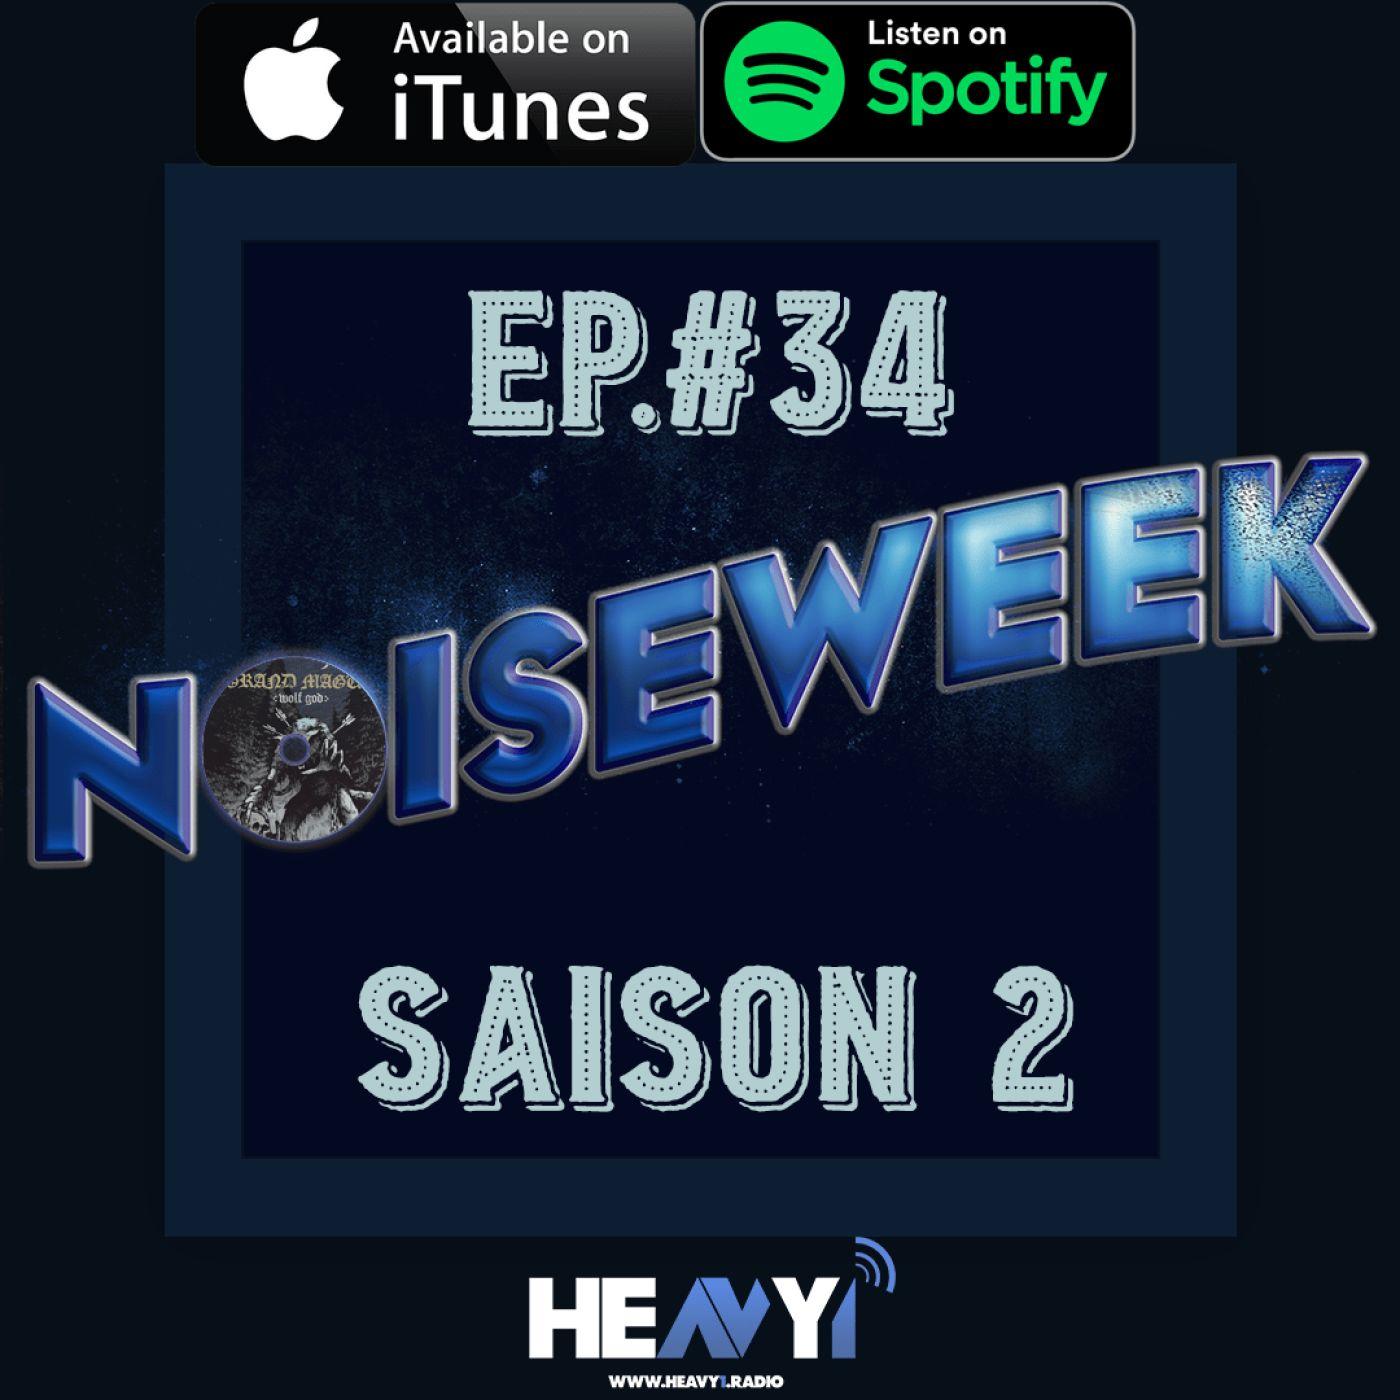 Noiseweek #34 Saison 2